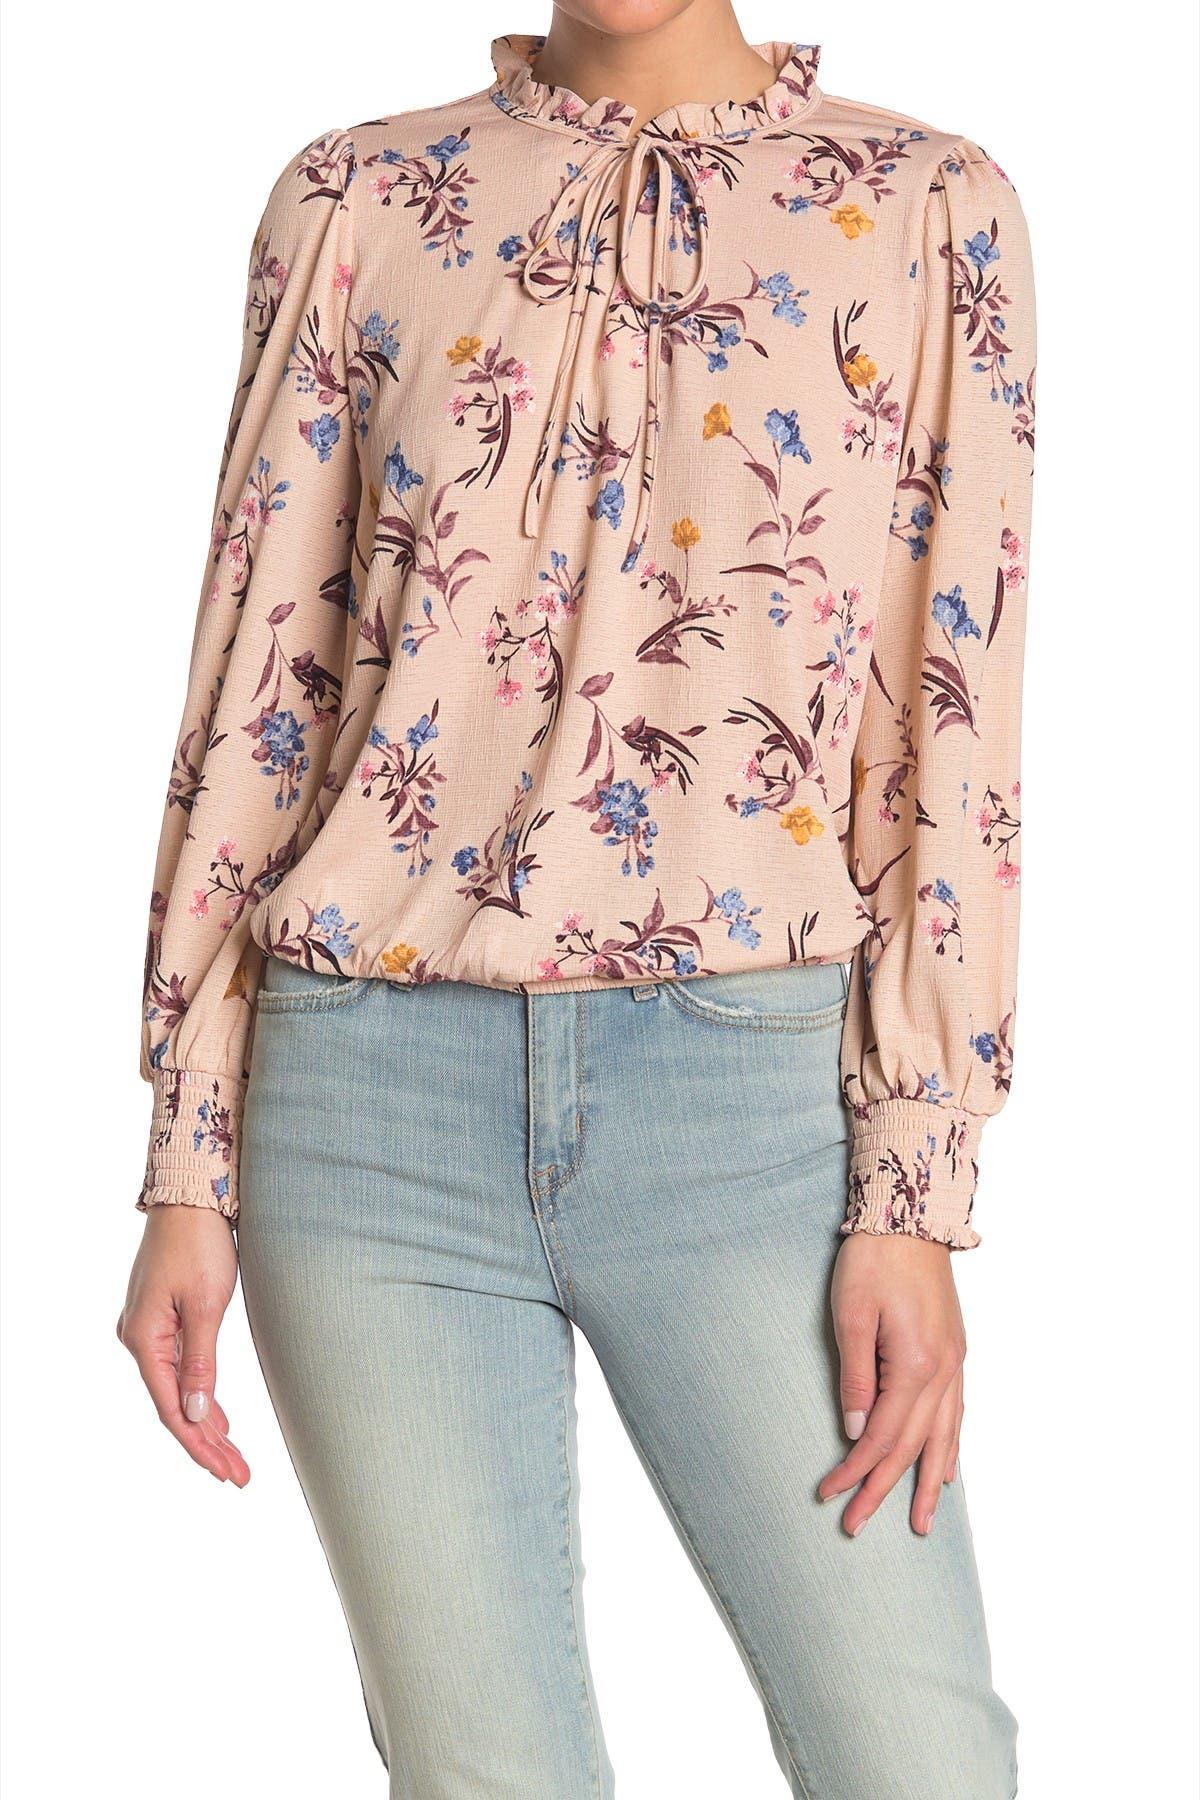 Melloday Floral Print Drawstring Smocked Hem Long Sleeve T-shirt In Light/pastel Red